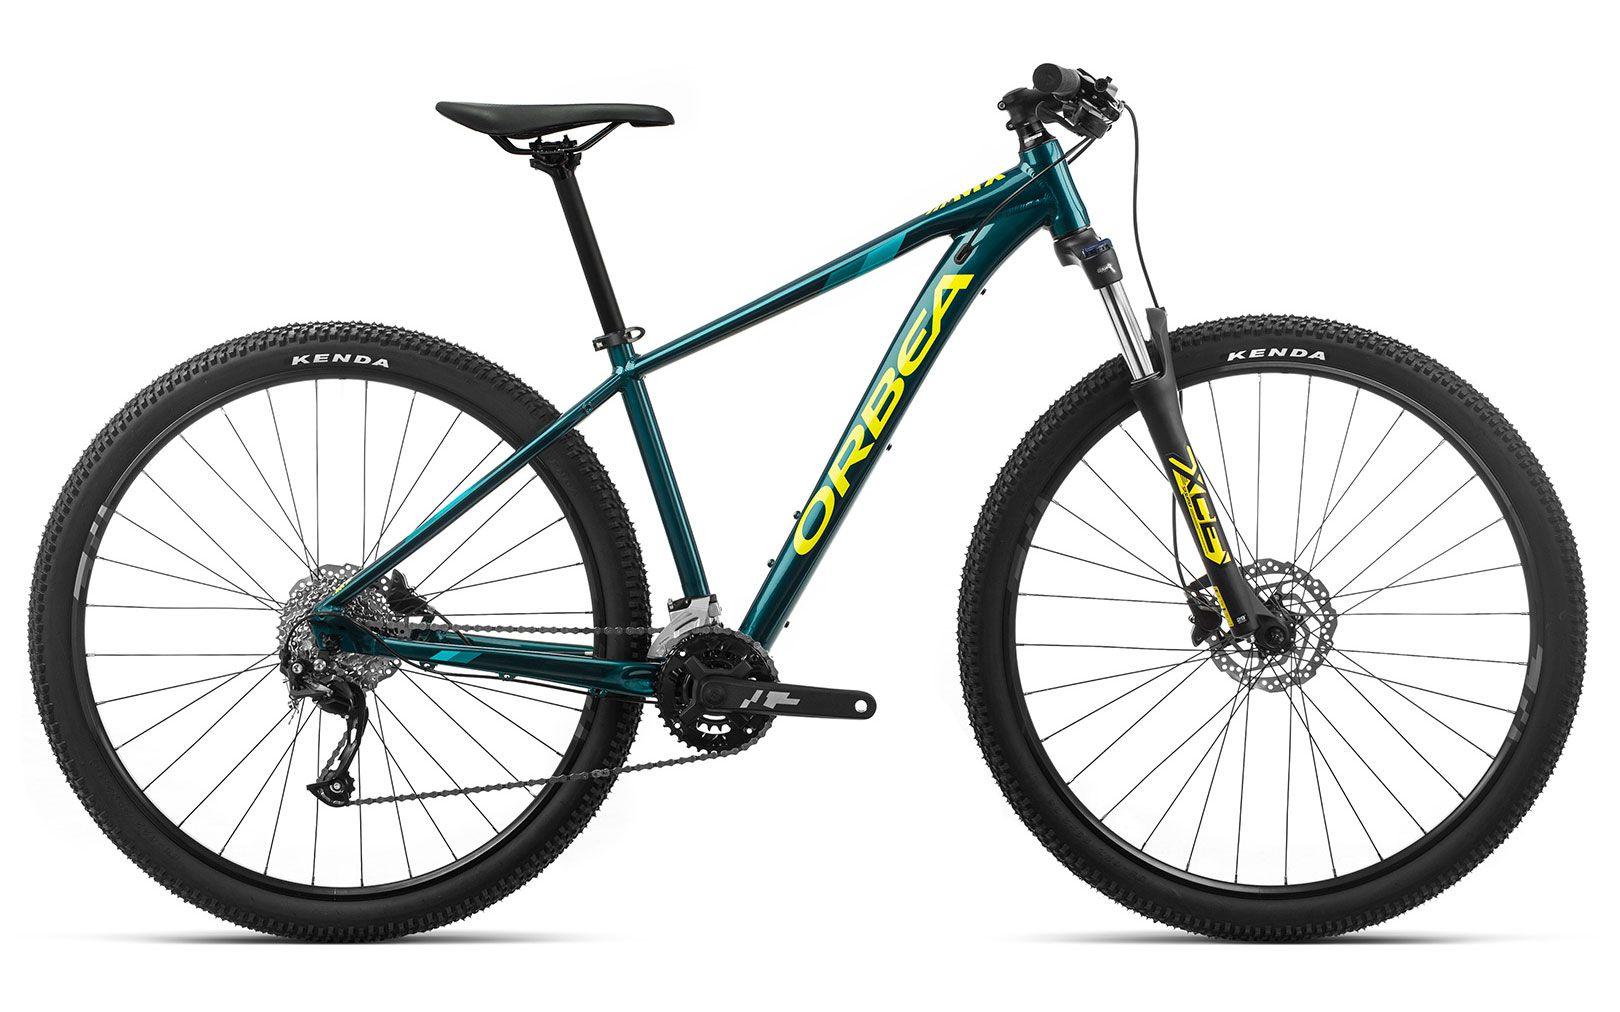 Bicicleta MTB Orbea MX 29 40 - Tam L - Oceano/Amarelo 2020